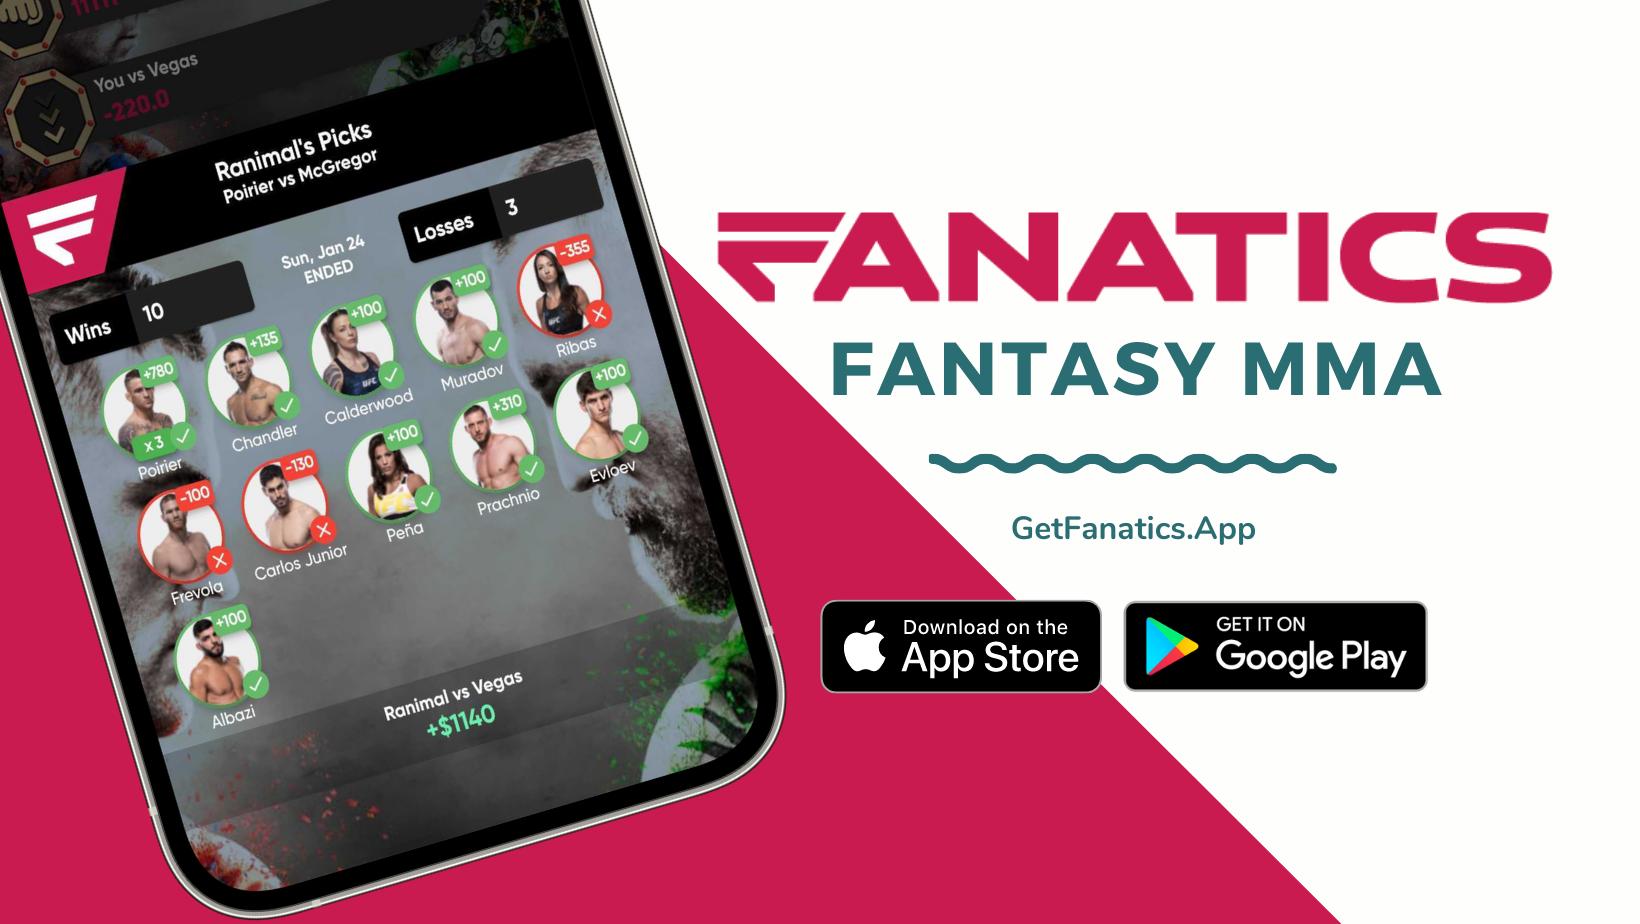 Fanatics Fantasy MMA enters the Daily Fantasy Sports industry with a focus on Asian MMA - fanatics